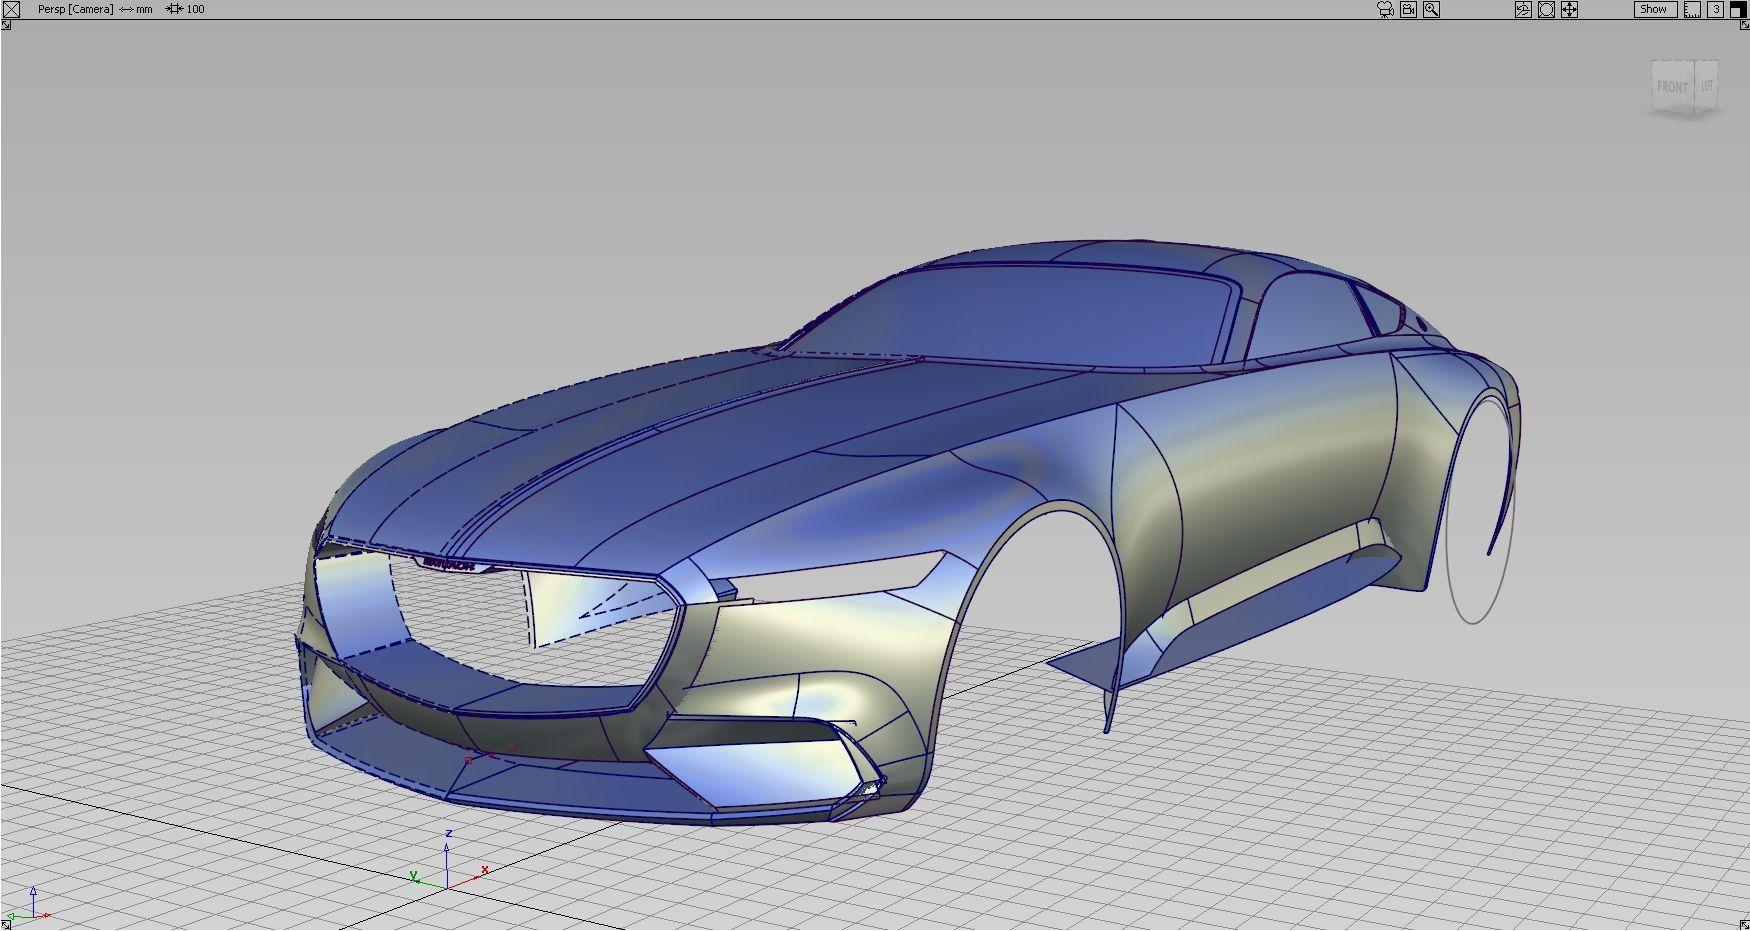 Alias Vred Mercedes Benz Vision Maybach 6 Concept On Behance Concept Car Sketch Maybach Car Model